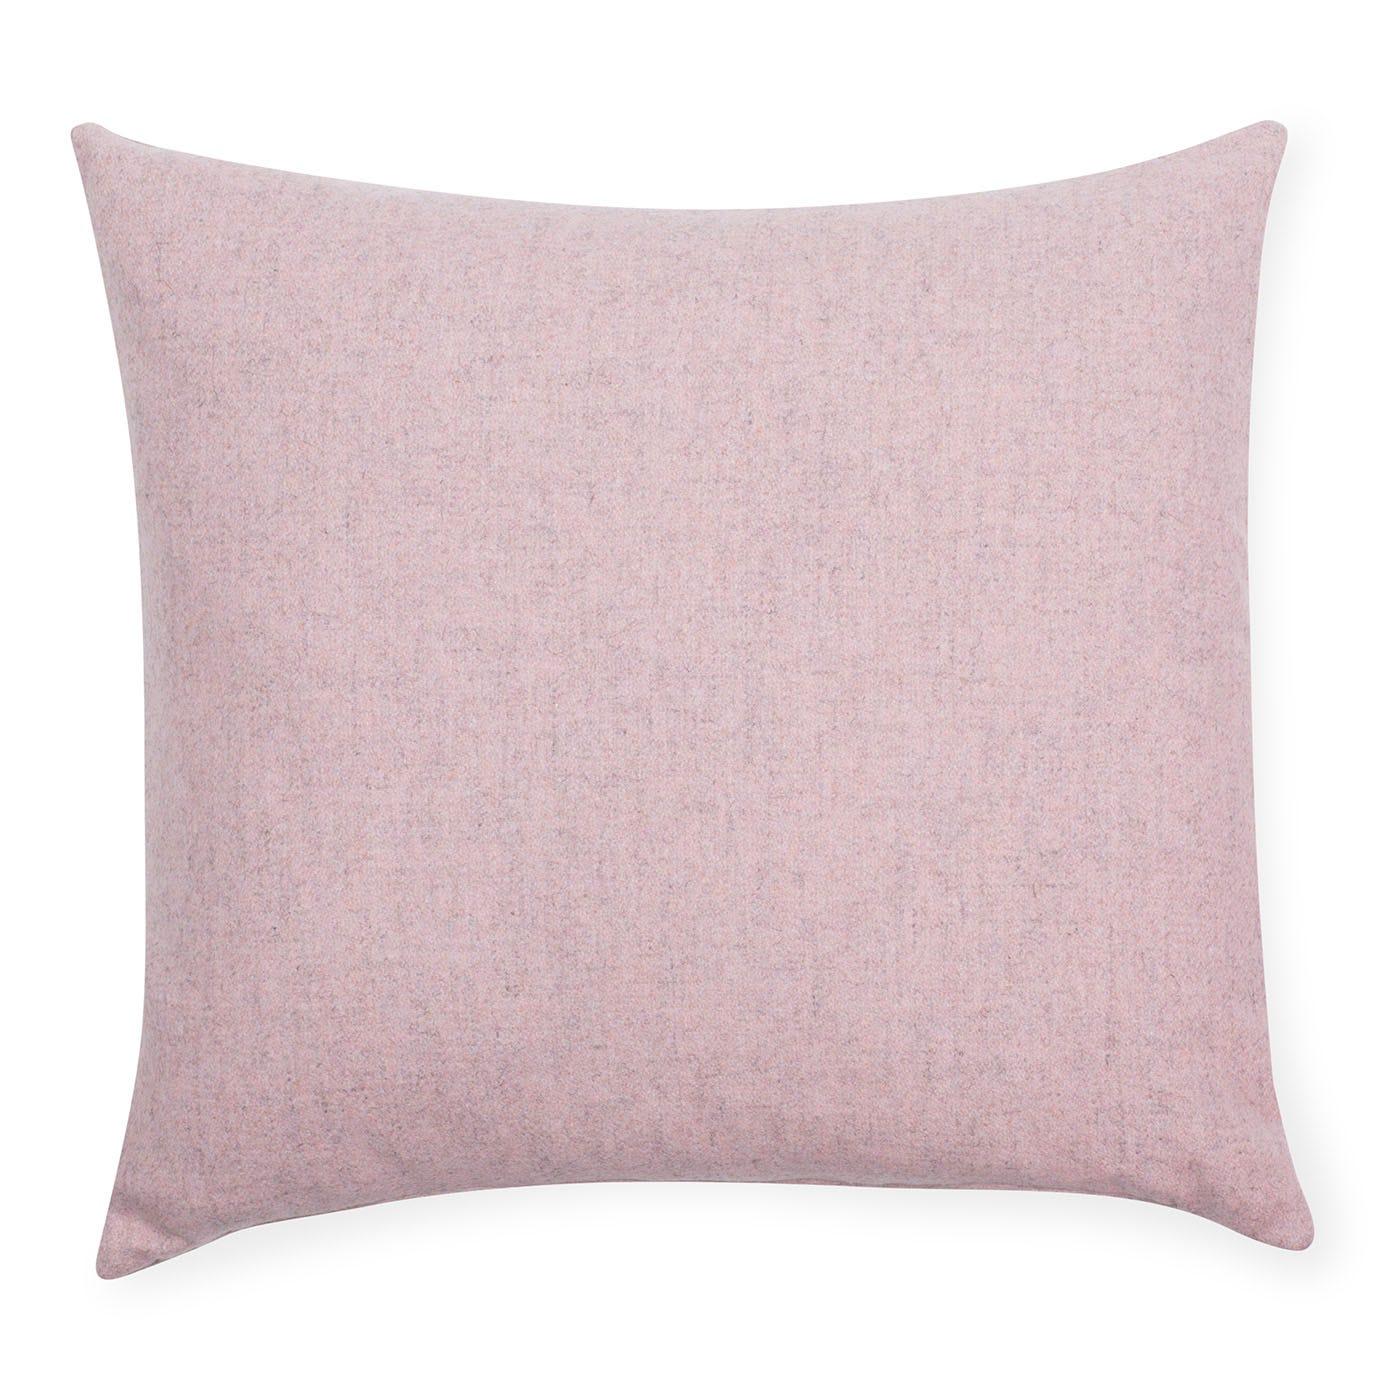 Islington Wool Cushion Blush 45 x 45cm